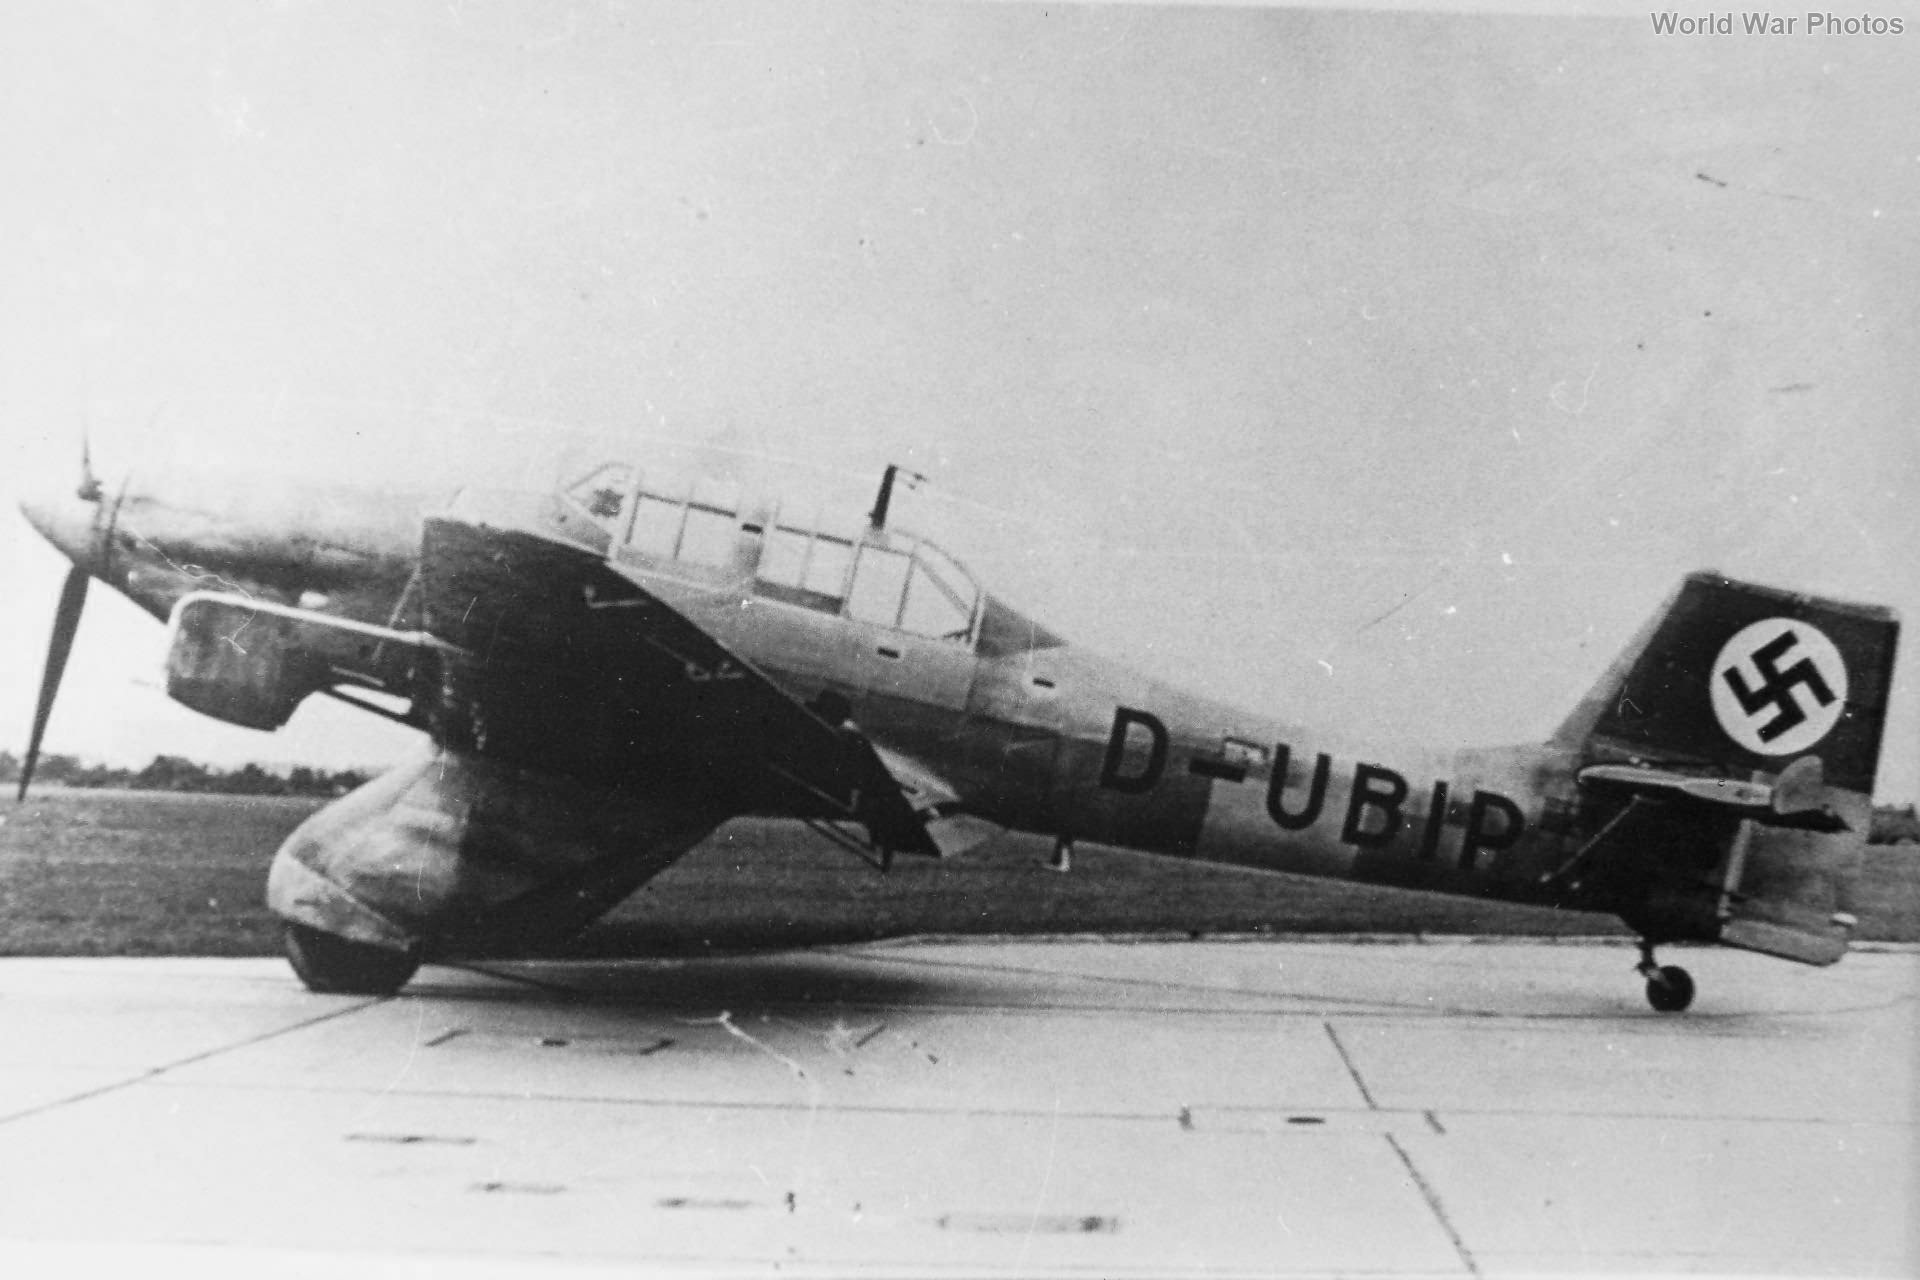 Ju 87 V-4 D-UBIP